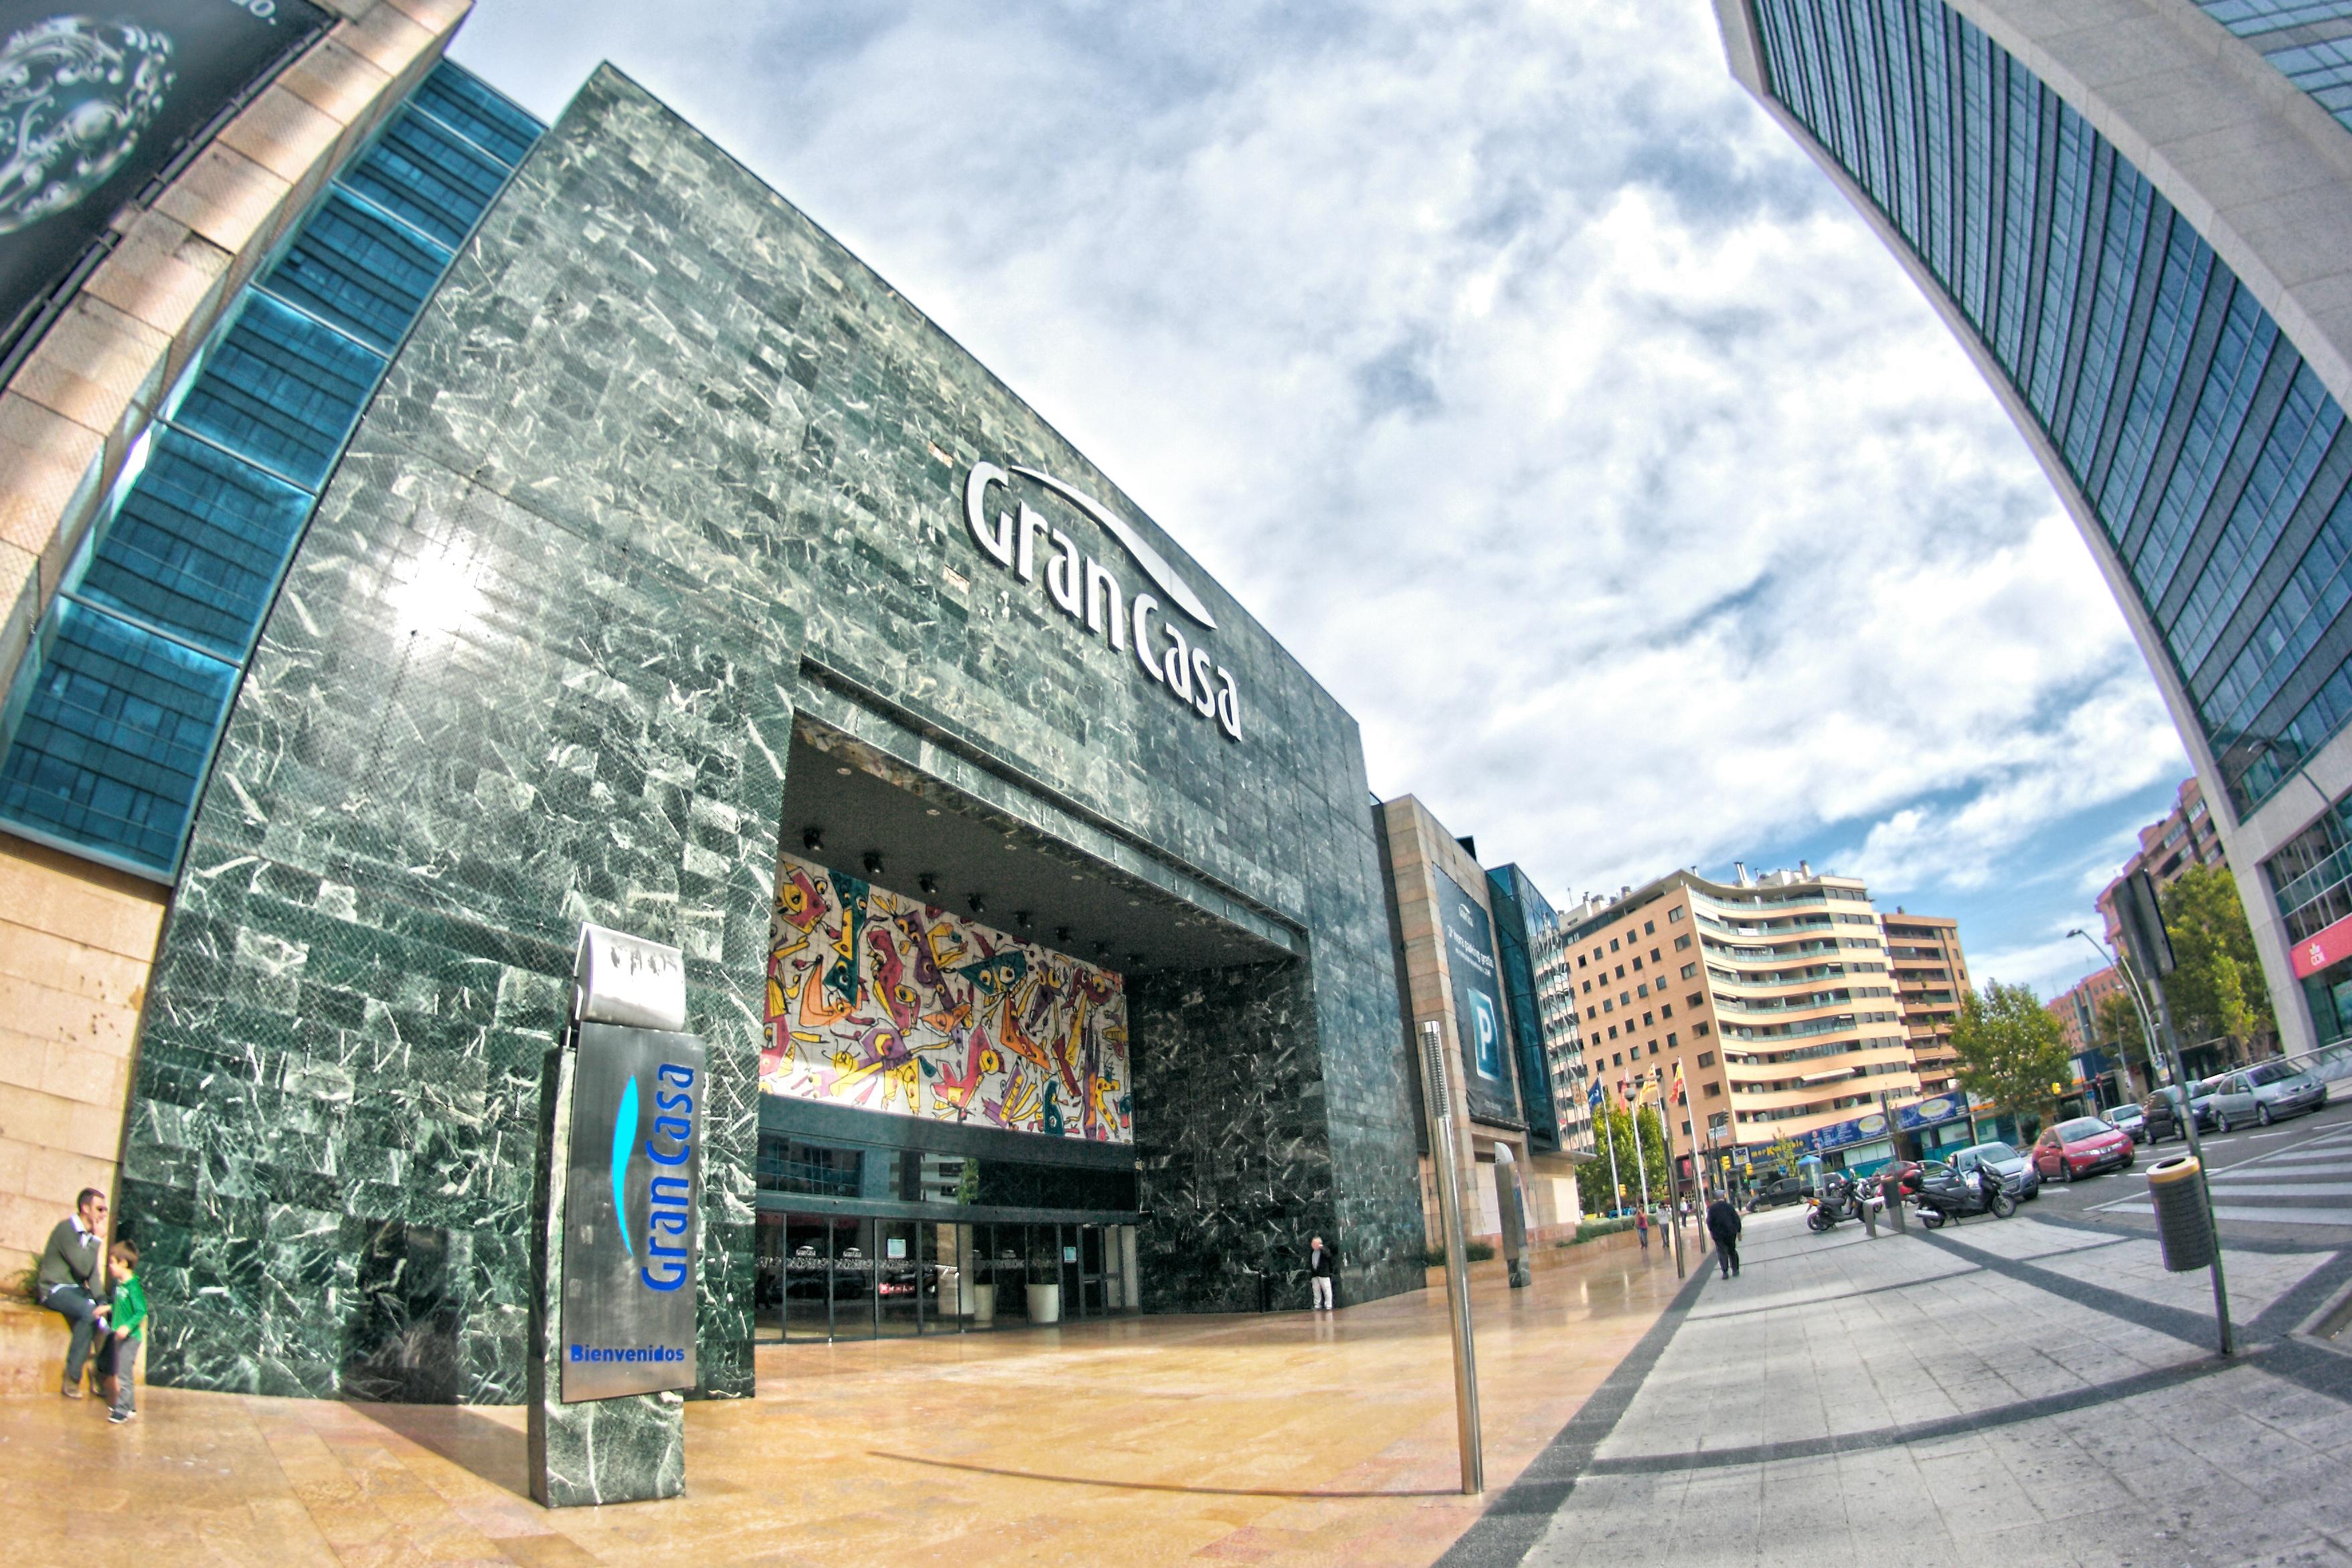 Shopping Gran Casa, em Zaragoça / Wikimedia commons